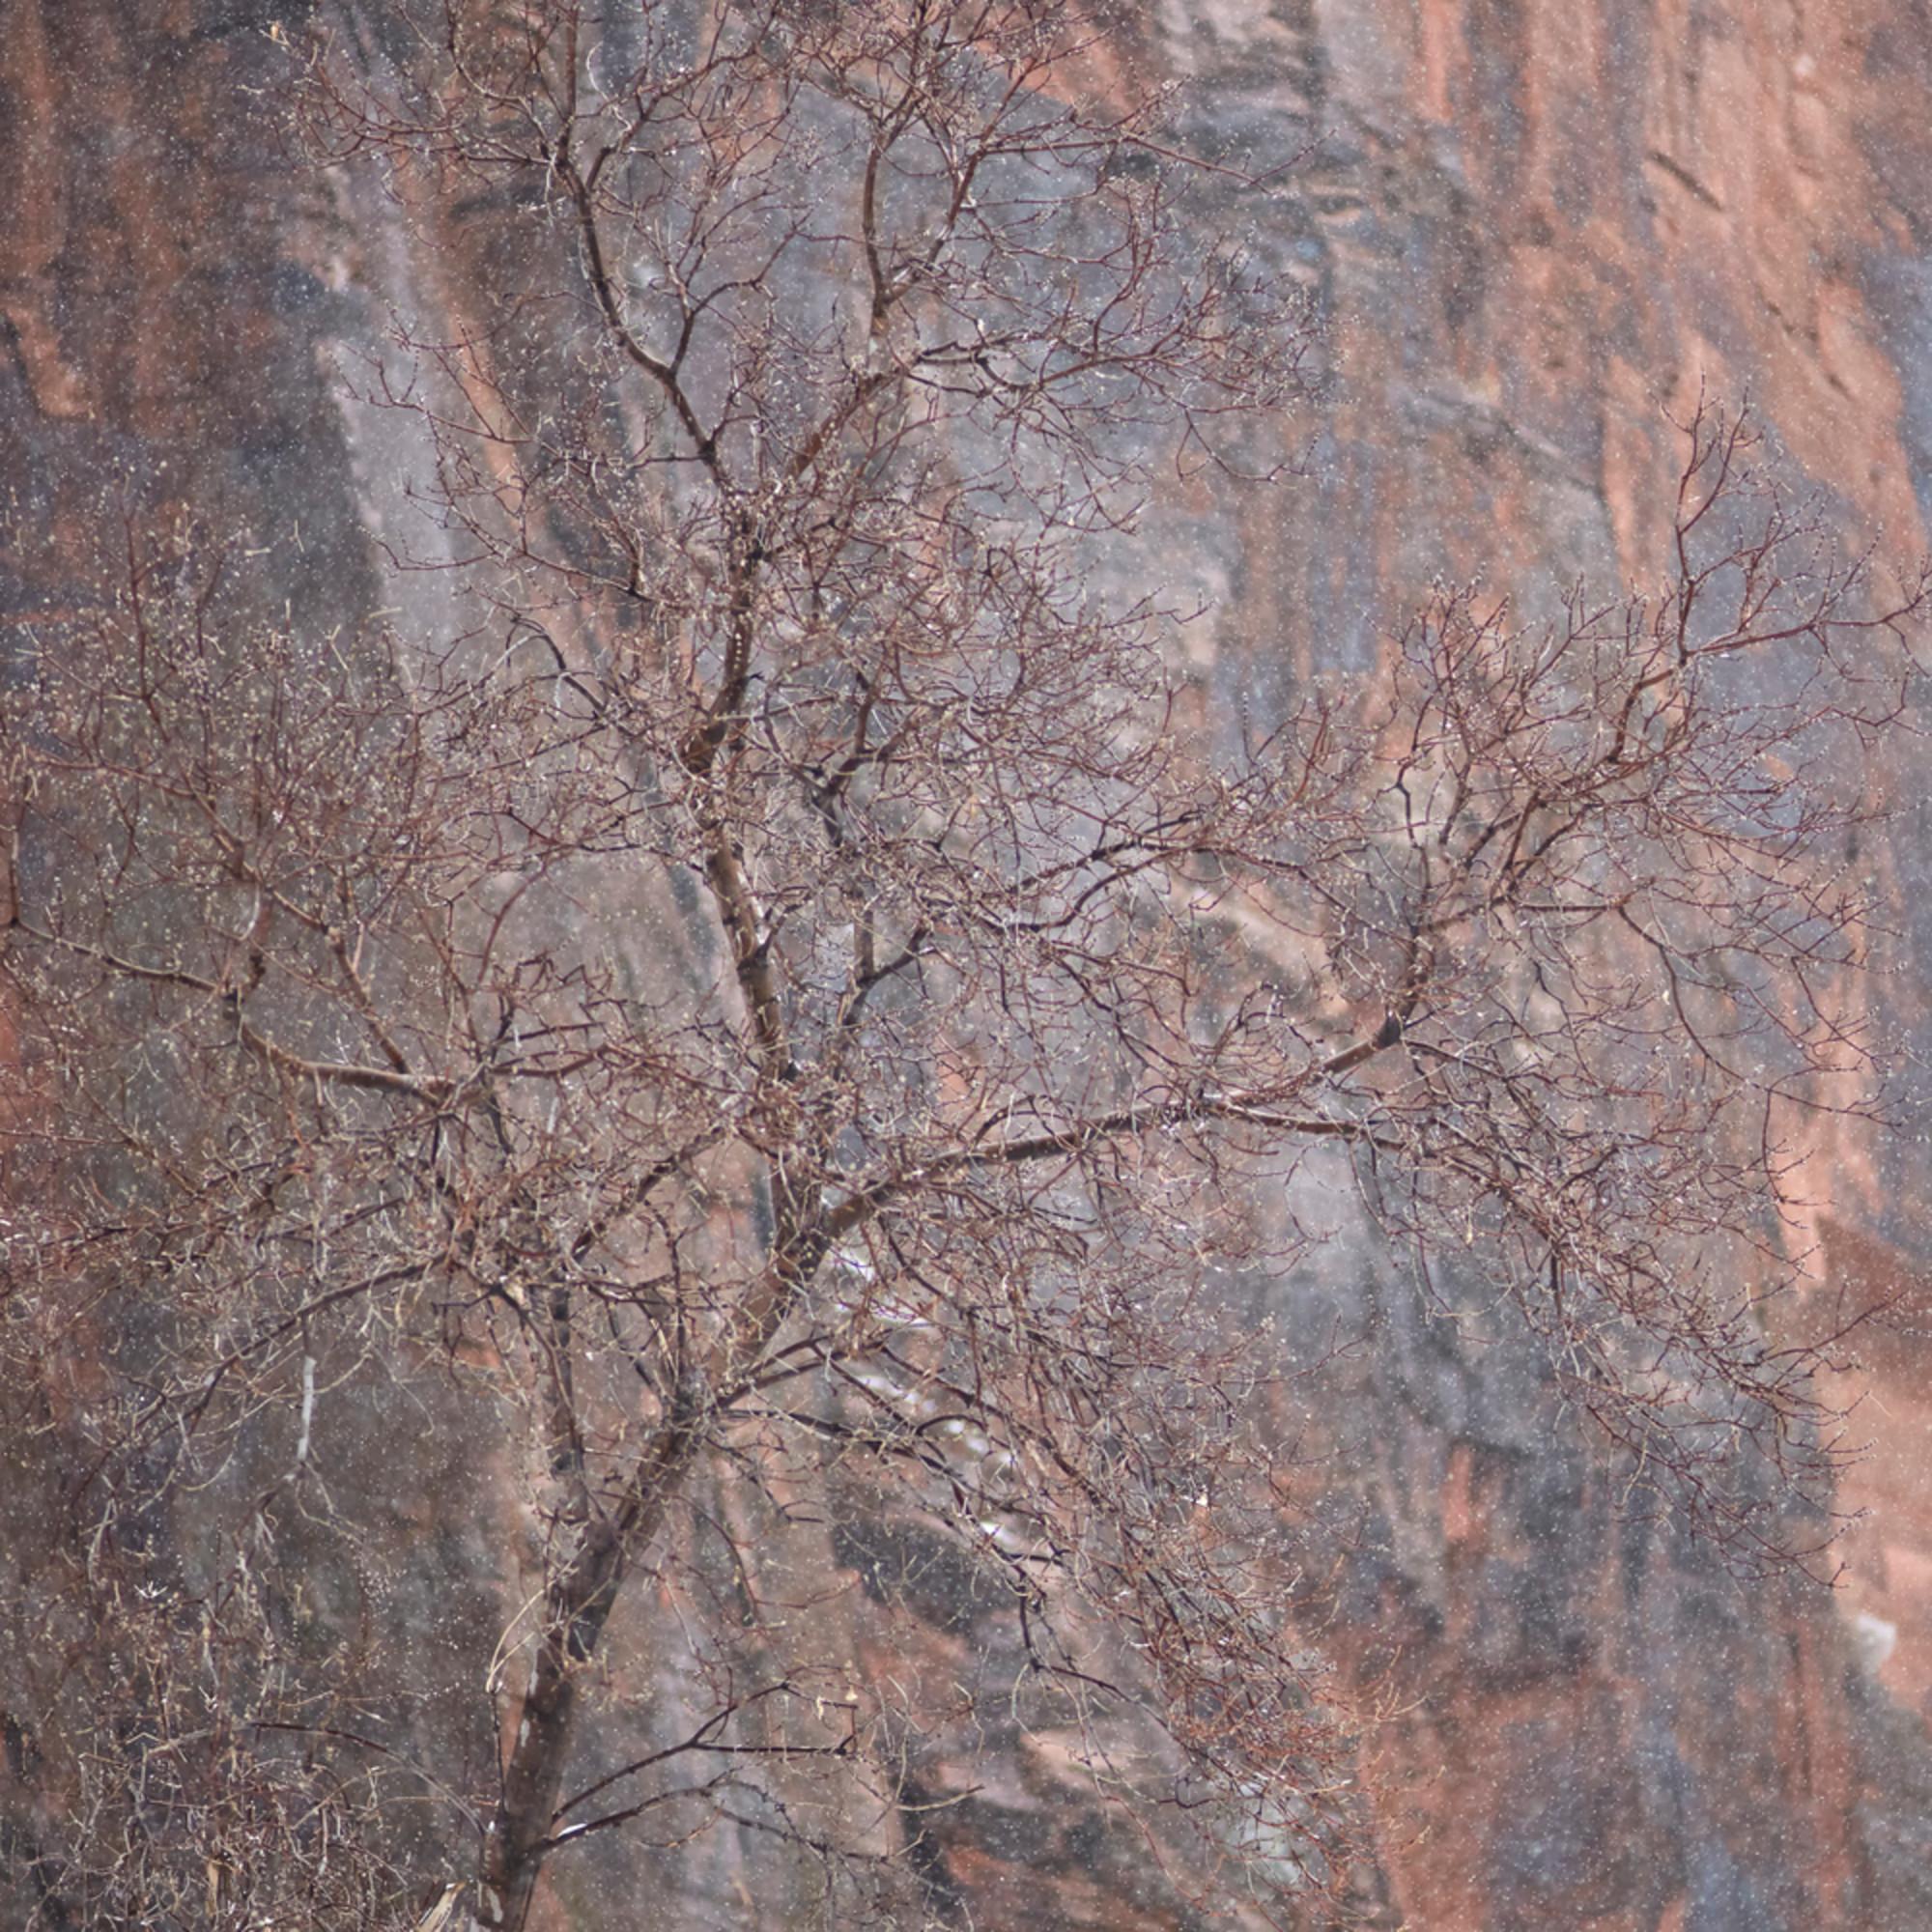 Sinawava tree charlie 4x5 njzysh